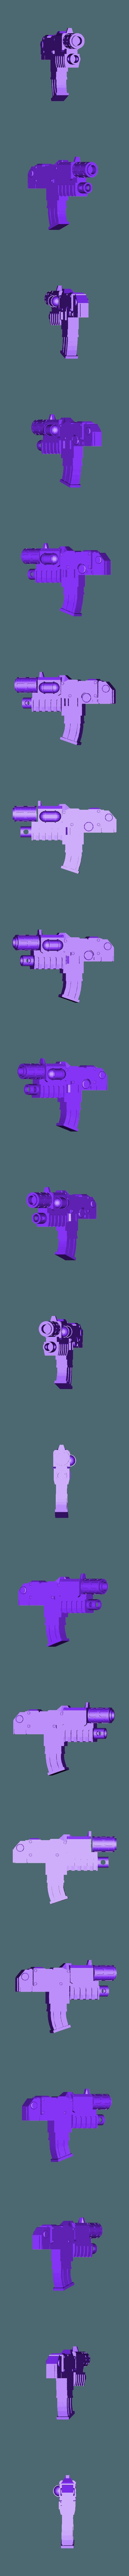 CombiMelta2.stl Download free STL file Combi Melta Guns • 3D printer design, MKojiro